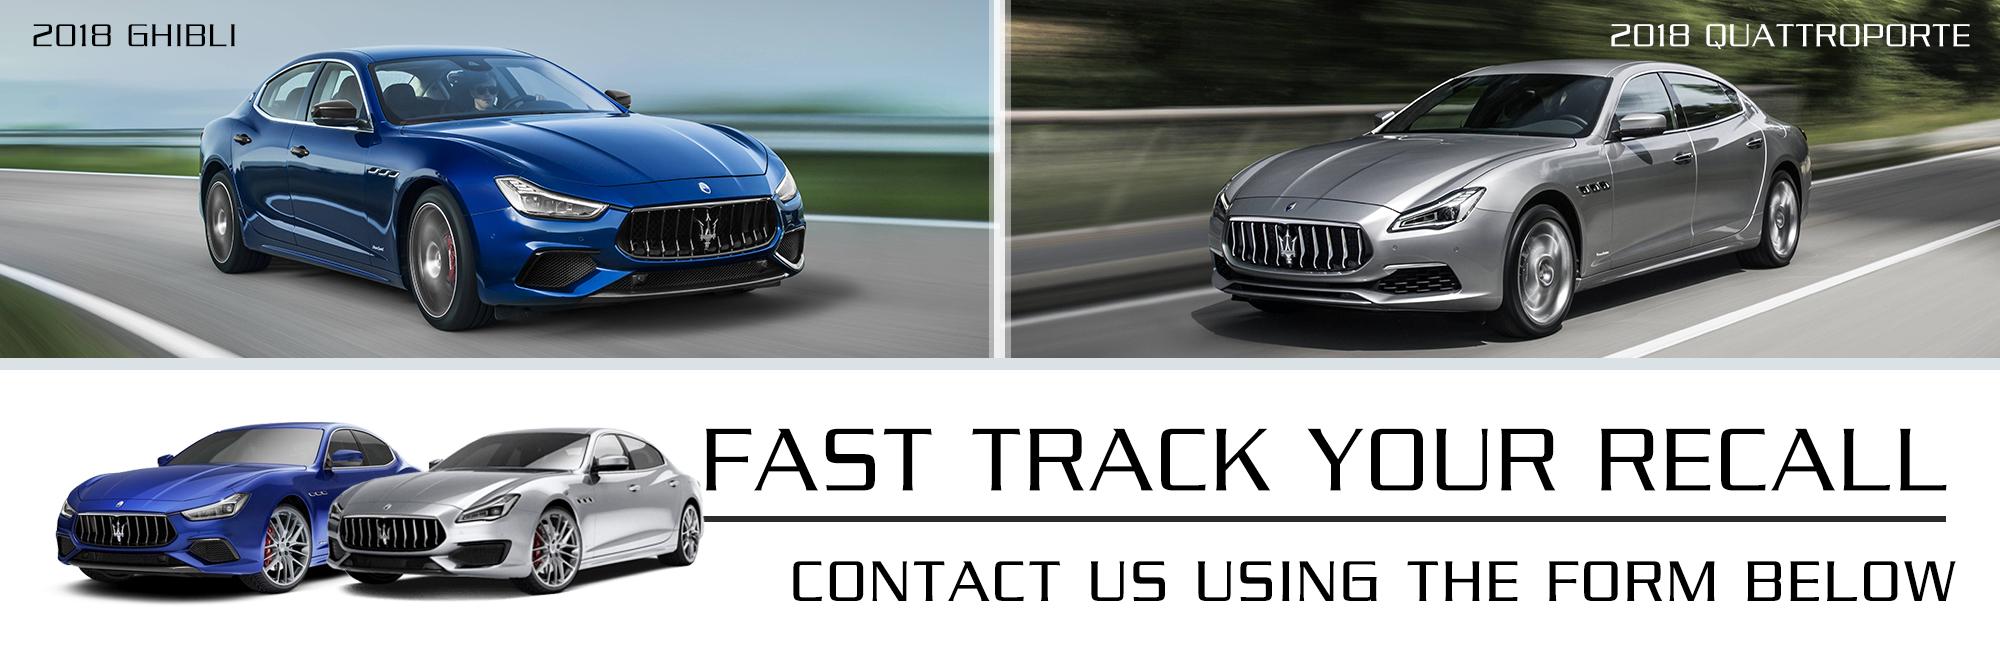 Fast Track Your Recall Jim Butler Maserati Jeep Comanche Selec Trac Vehicle Information